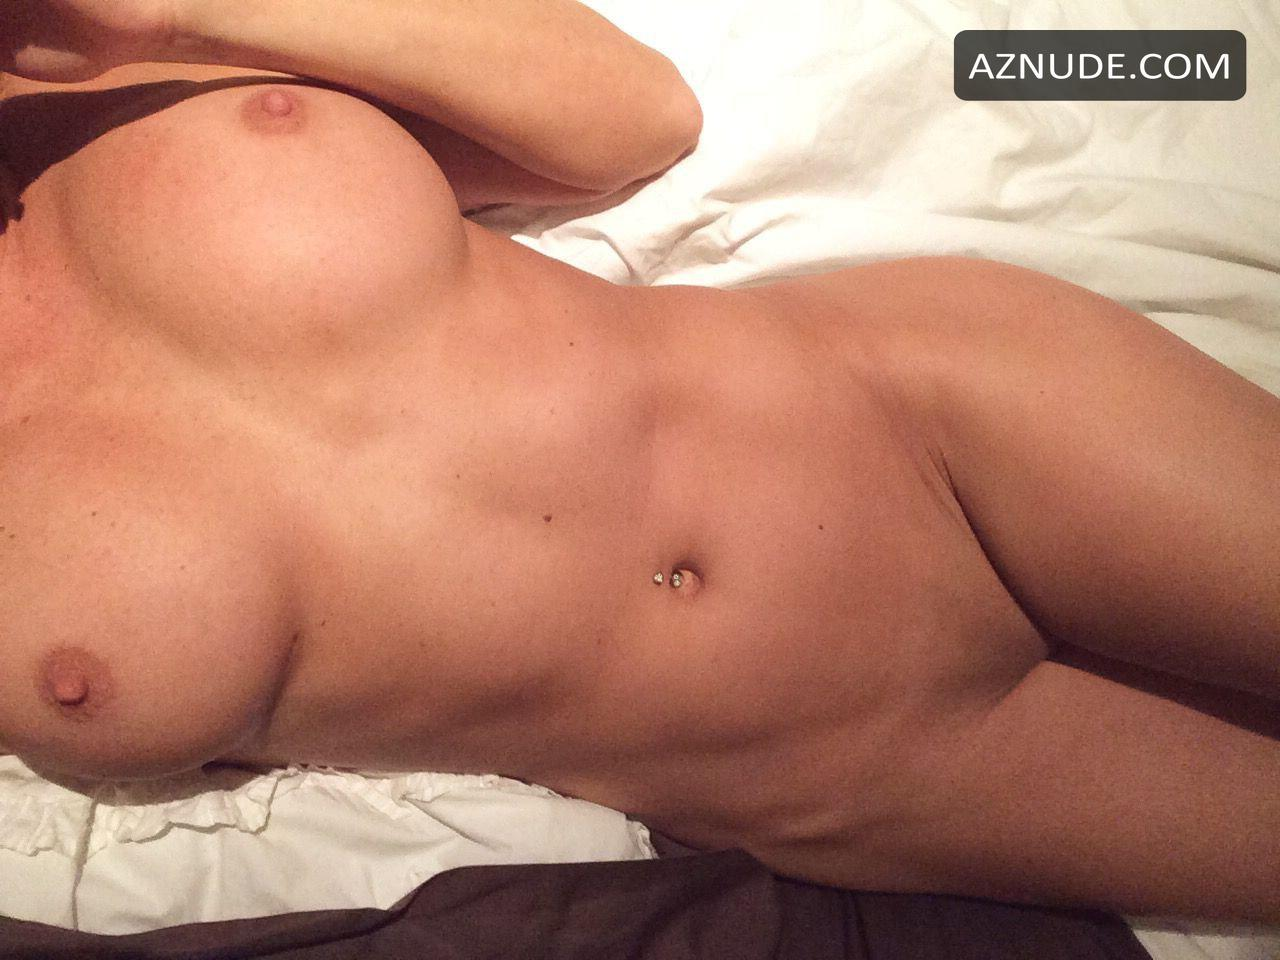 Amber nicole miller naked